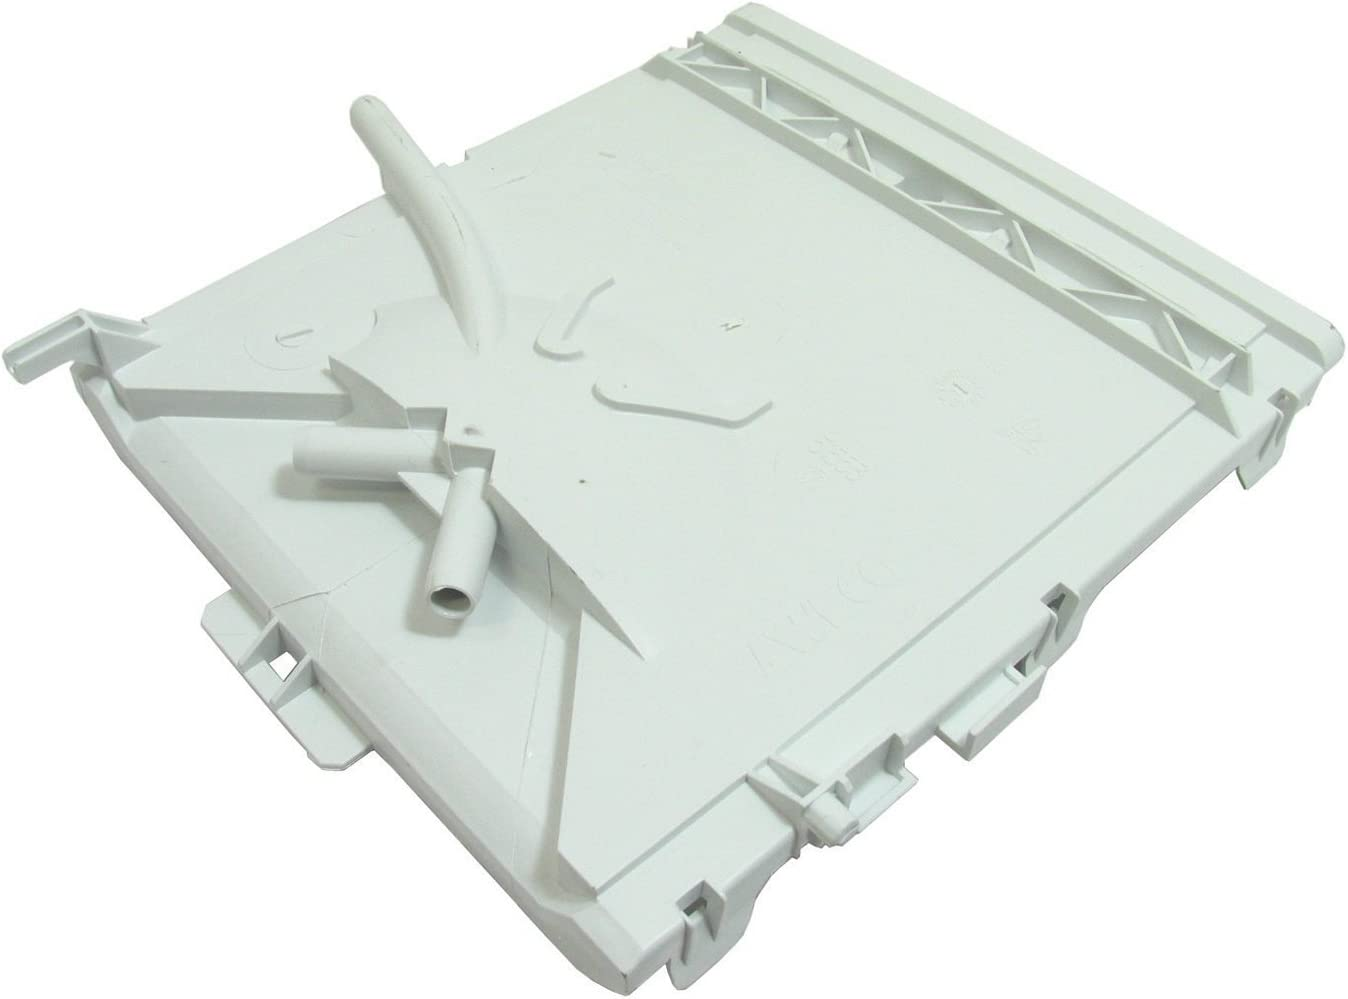 Lavadora Bosch de la cubierta superior del cajón dispensador de jabón